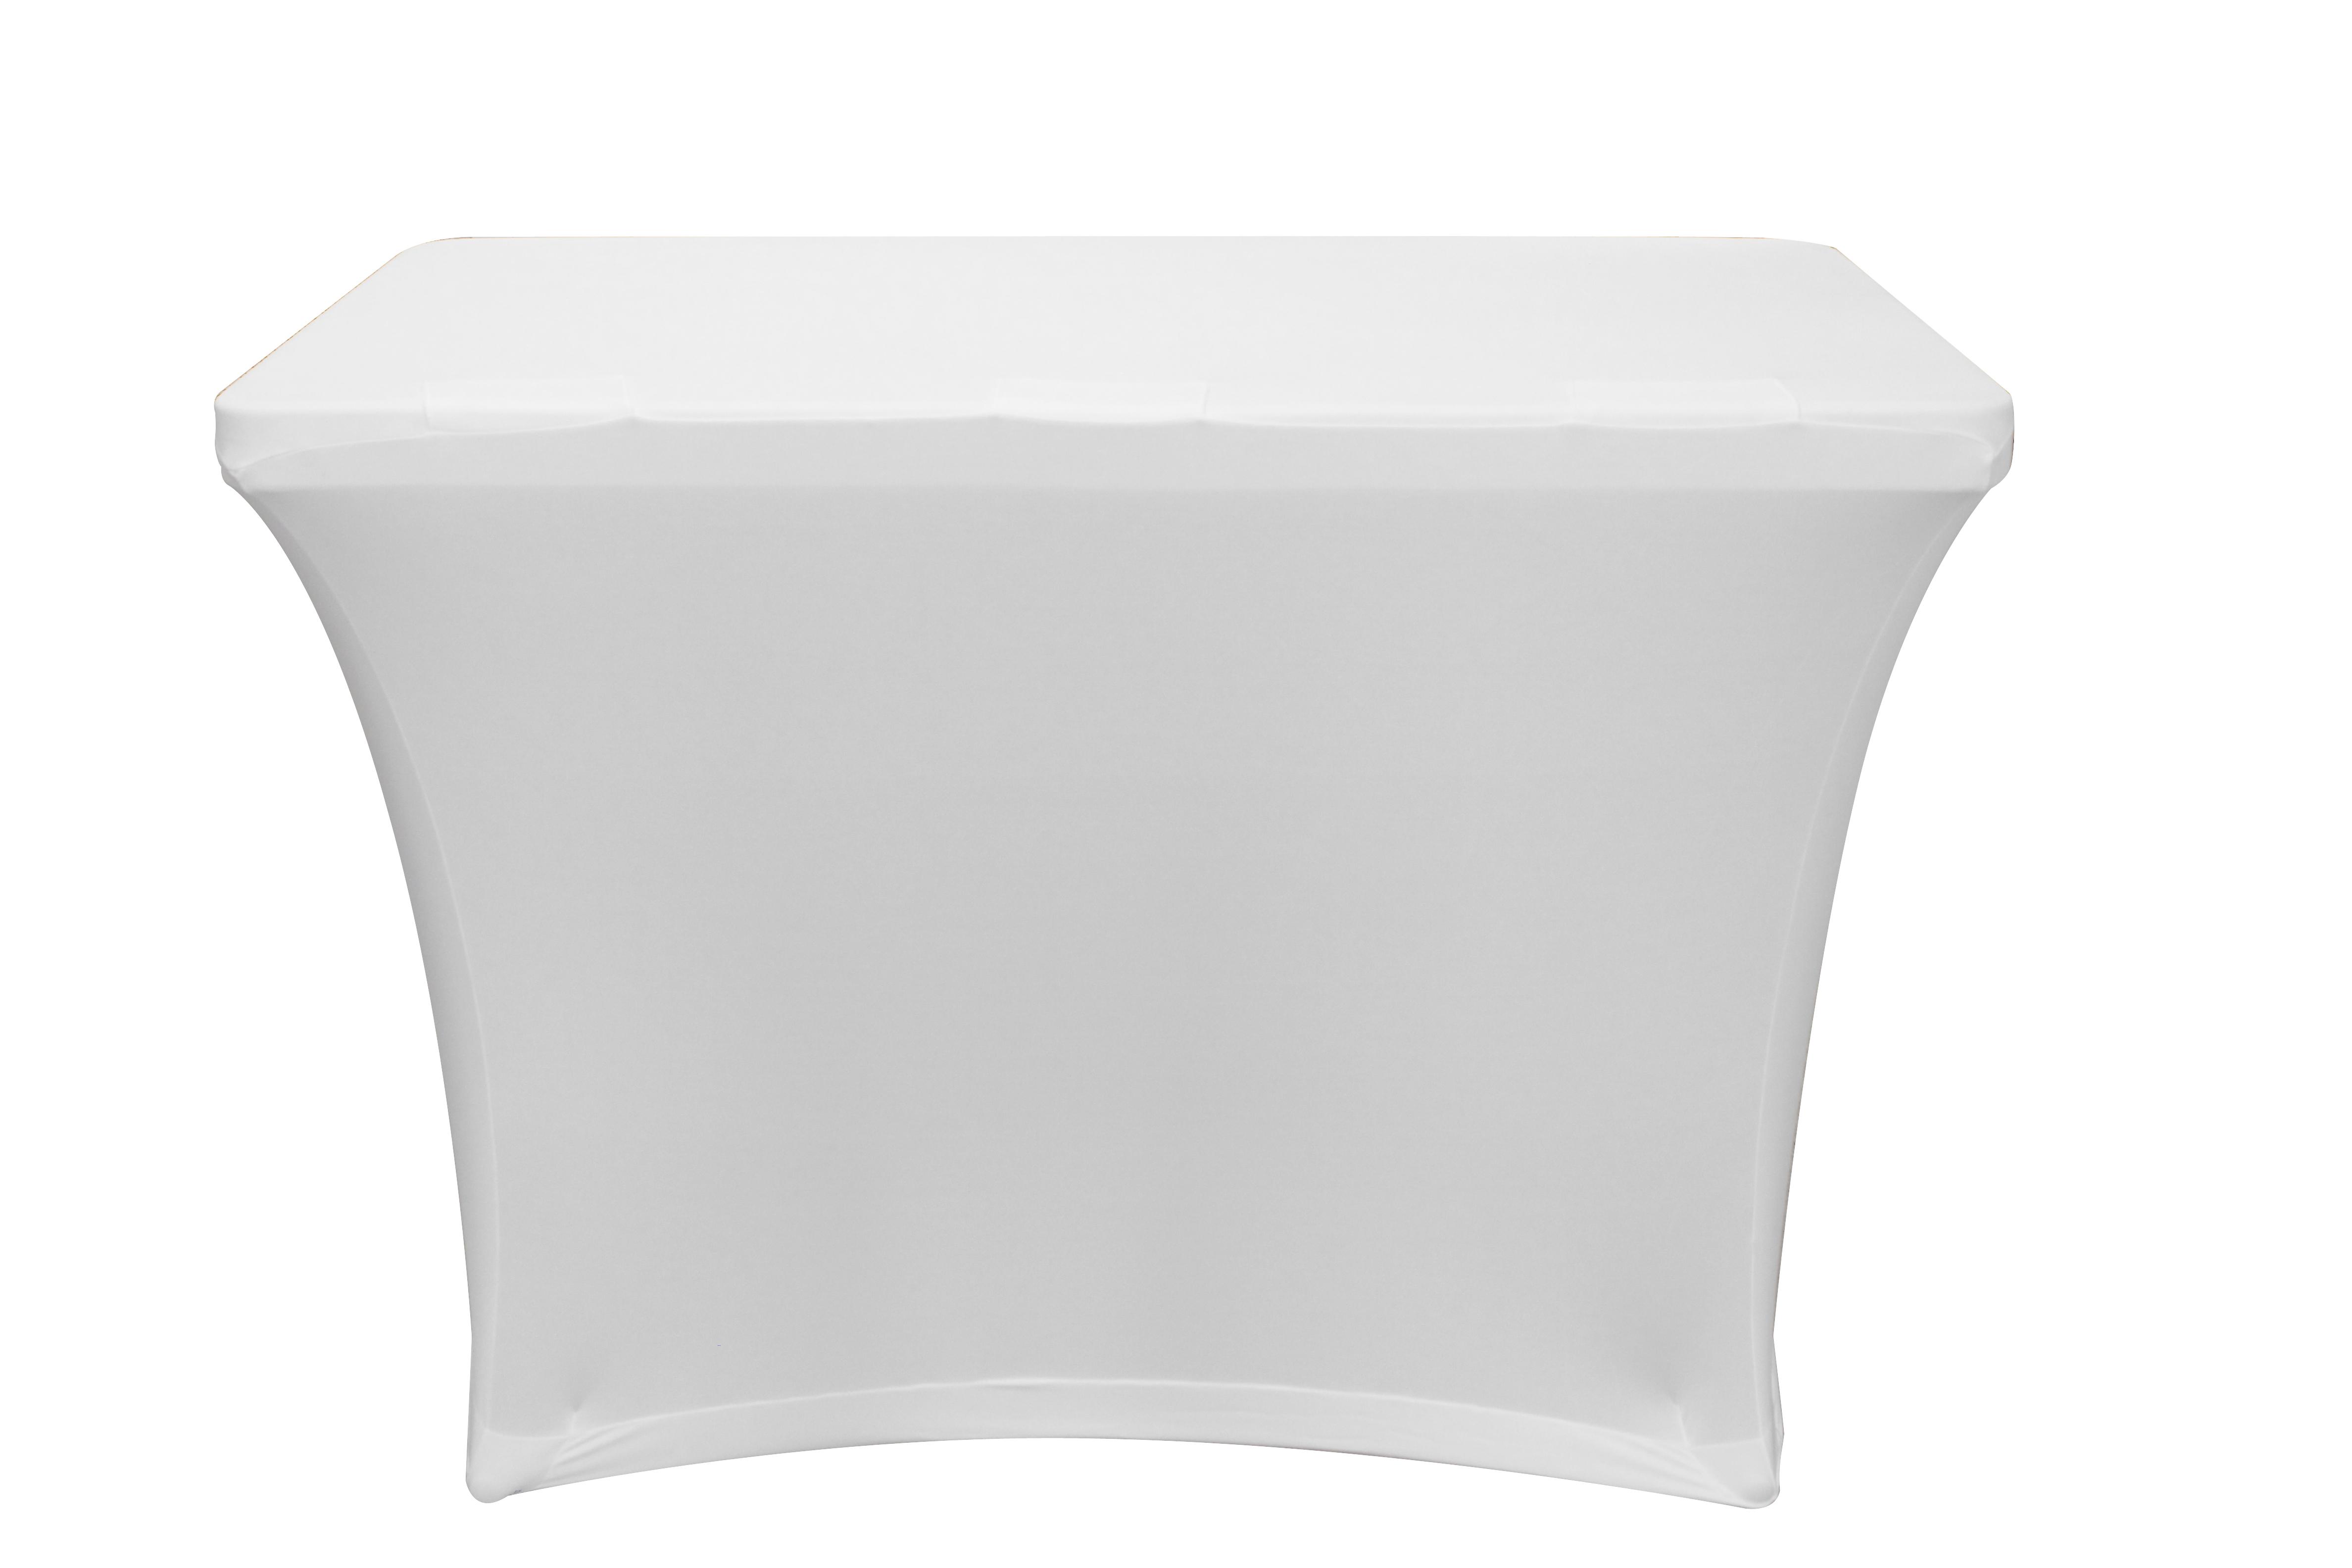 Odyssey Case SPATBL4WHT - Scrim for Banquet Table, 4'  White